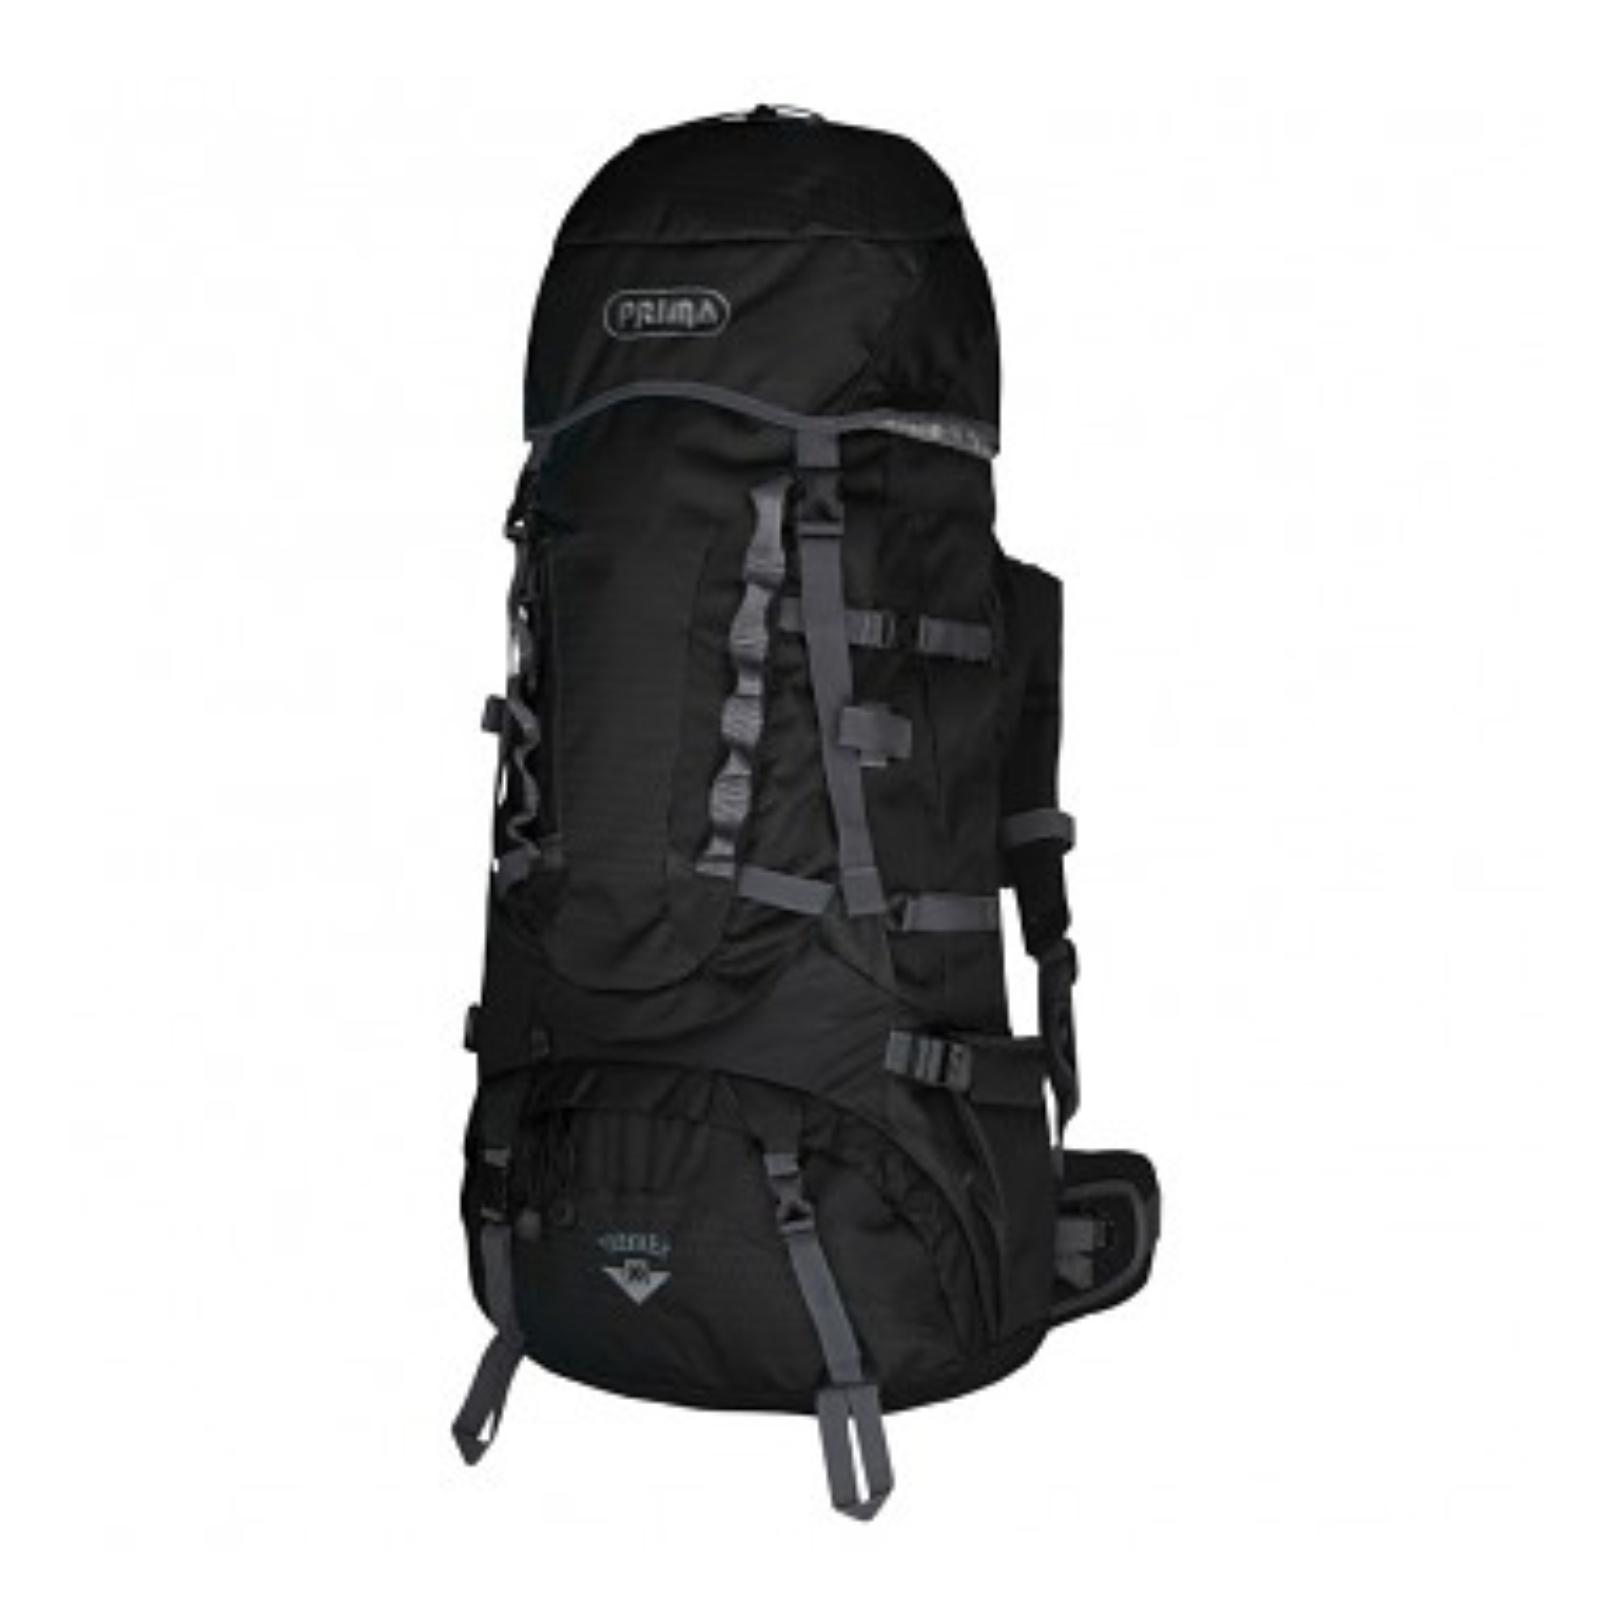 Batoh PRIMA Trekker 55 - černý